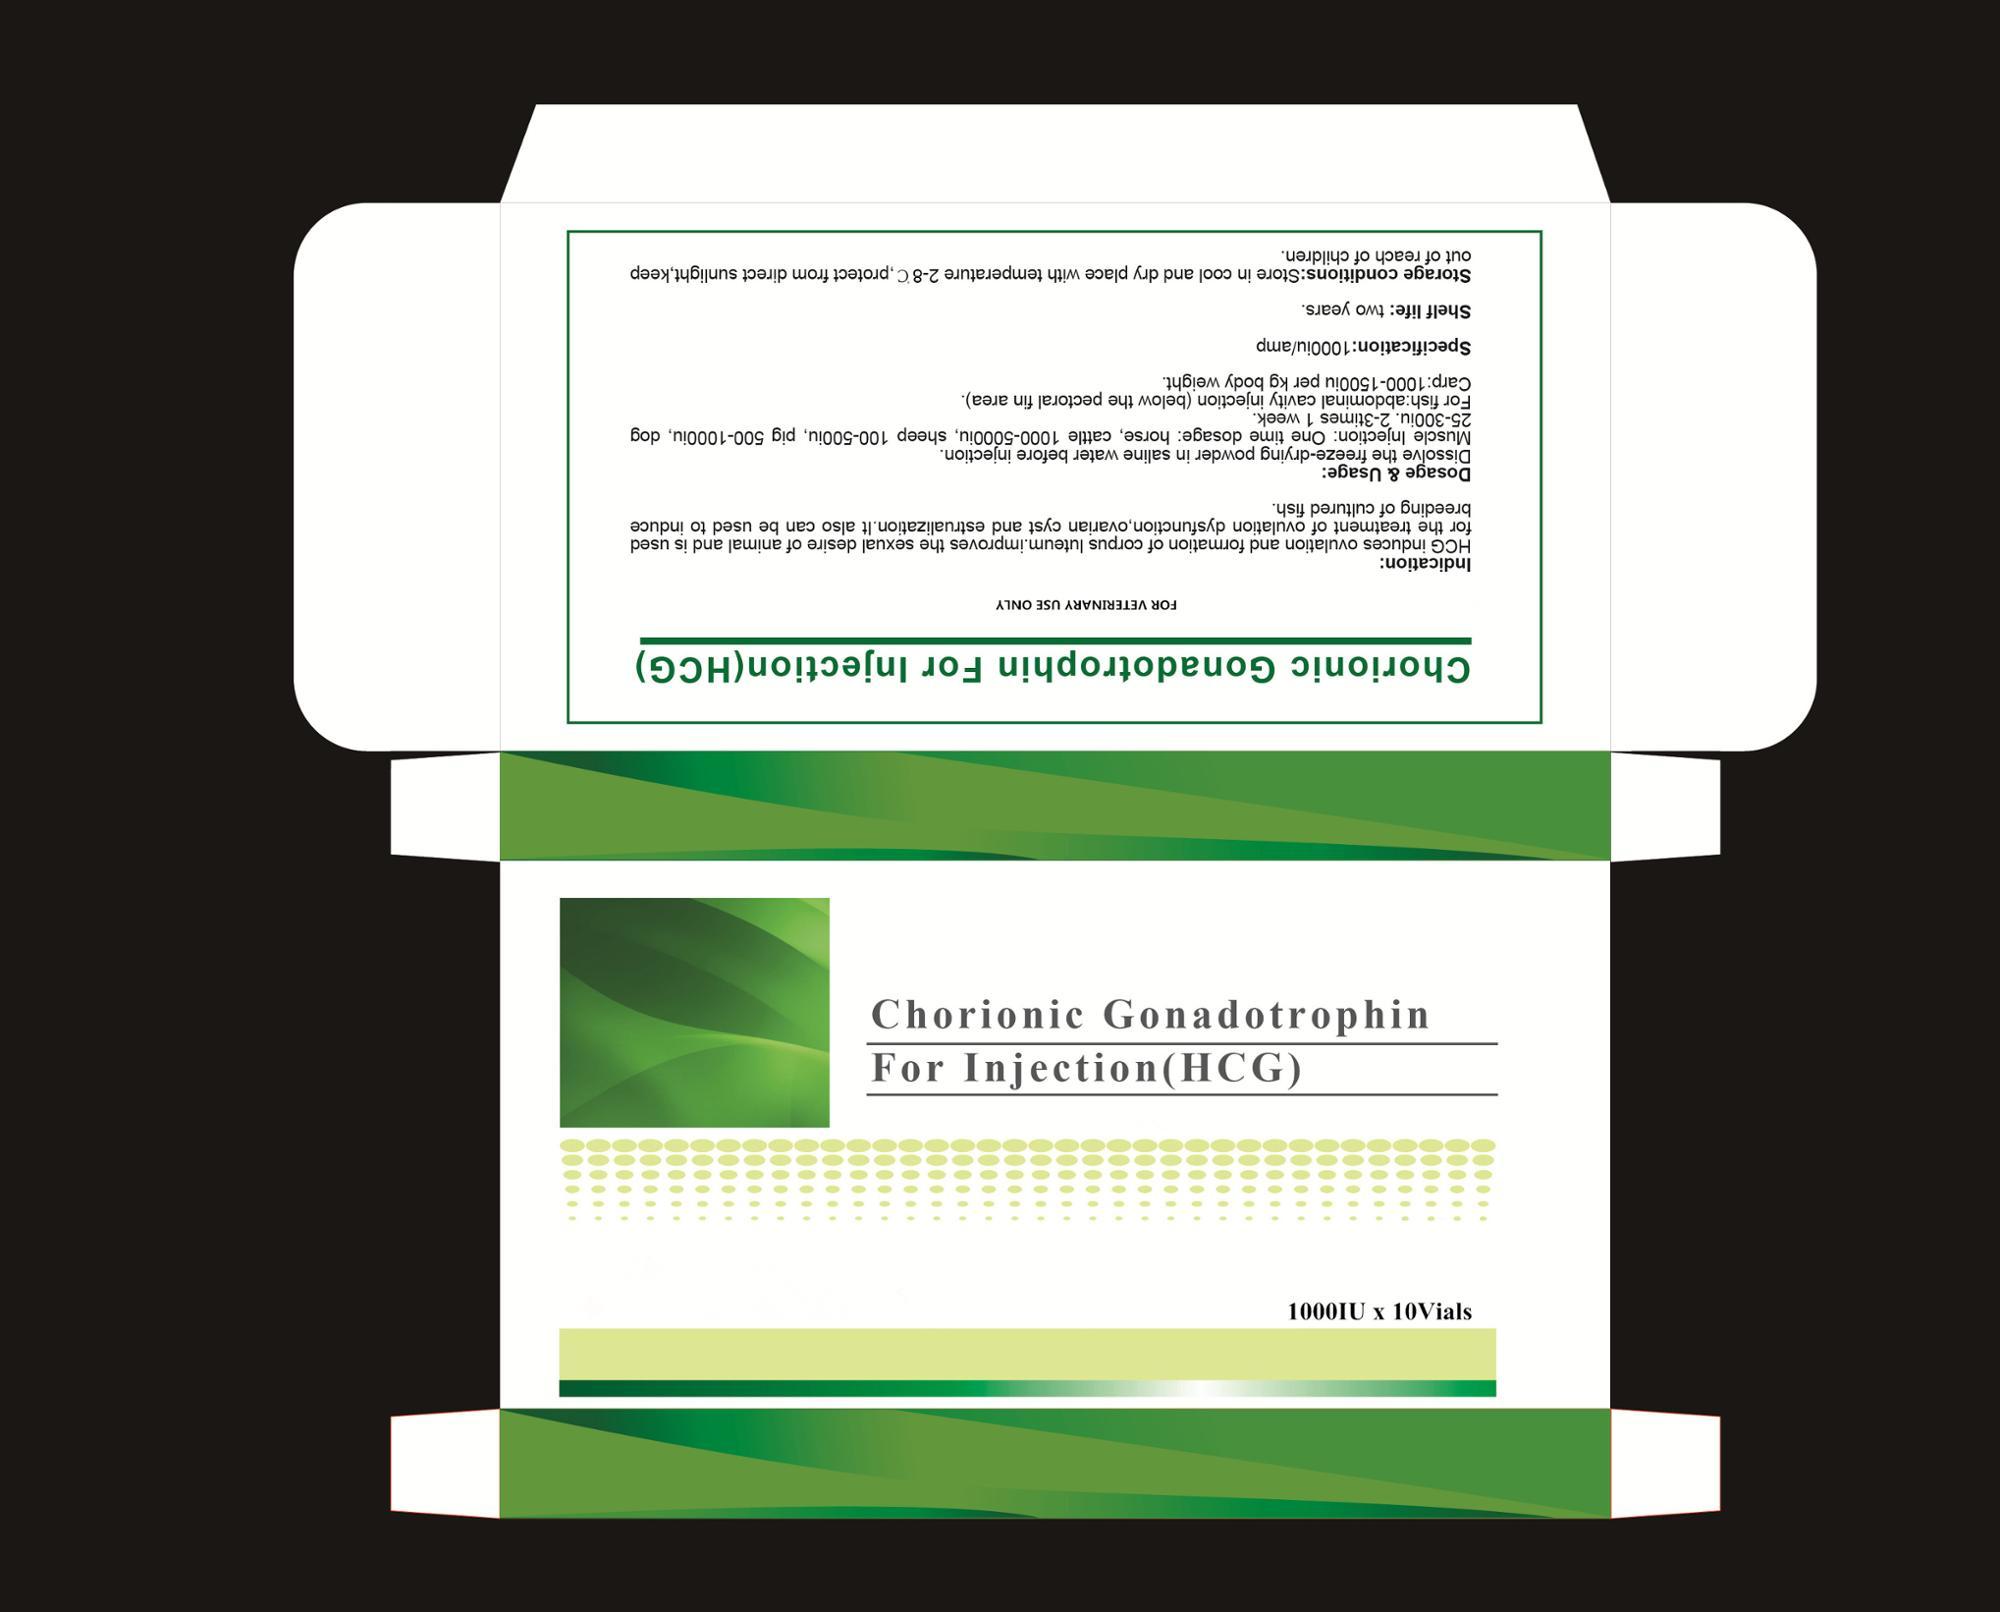 Hcg 1000iu Powder For Injection - Buy Hcg 1000iu Injection,Hcg Chorionic  Gonadotropin,Fish Hcg Product on Alibaba com